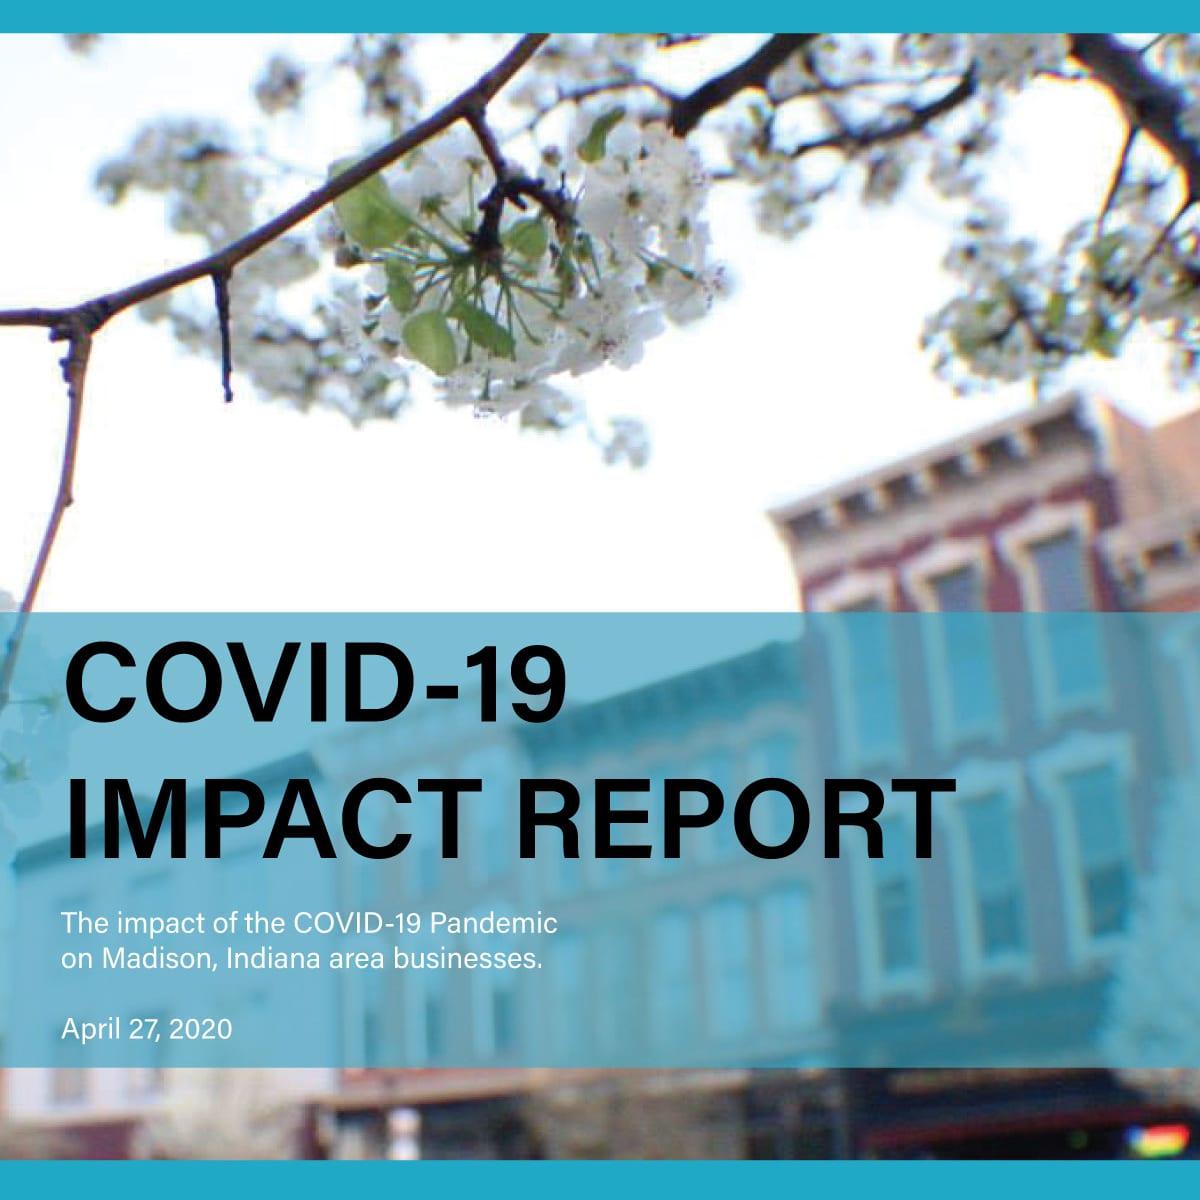 COVID-19-Pandemic-Impact-Report-Cover.jpg